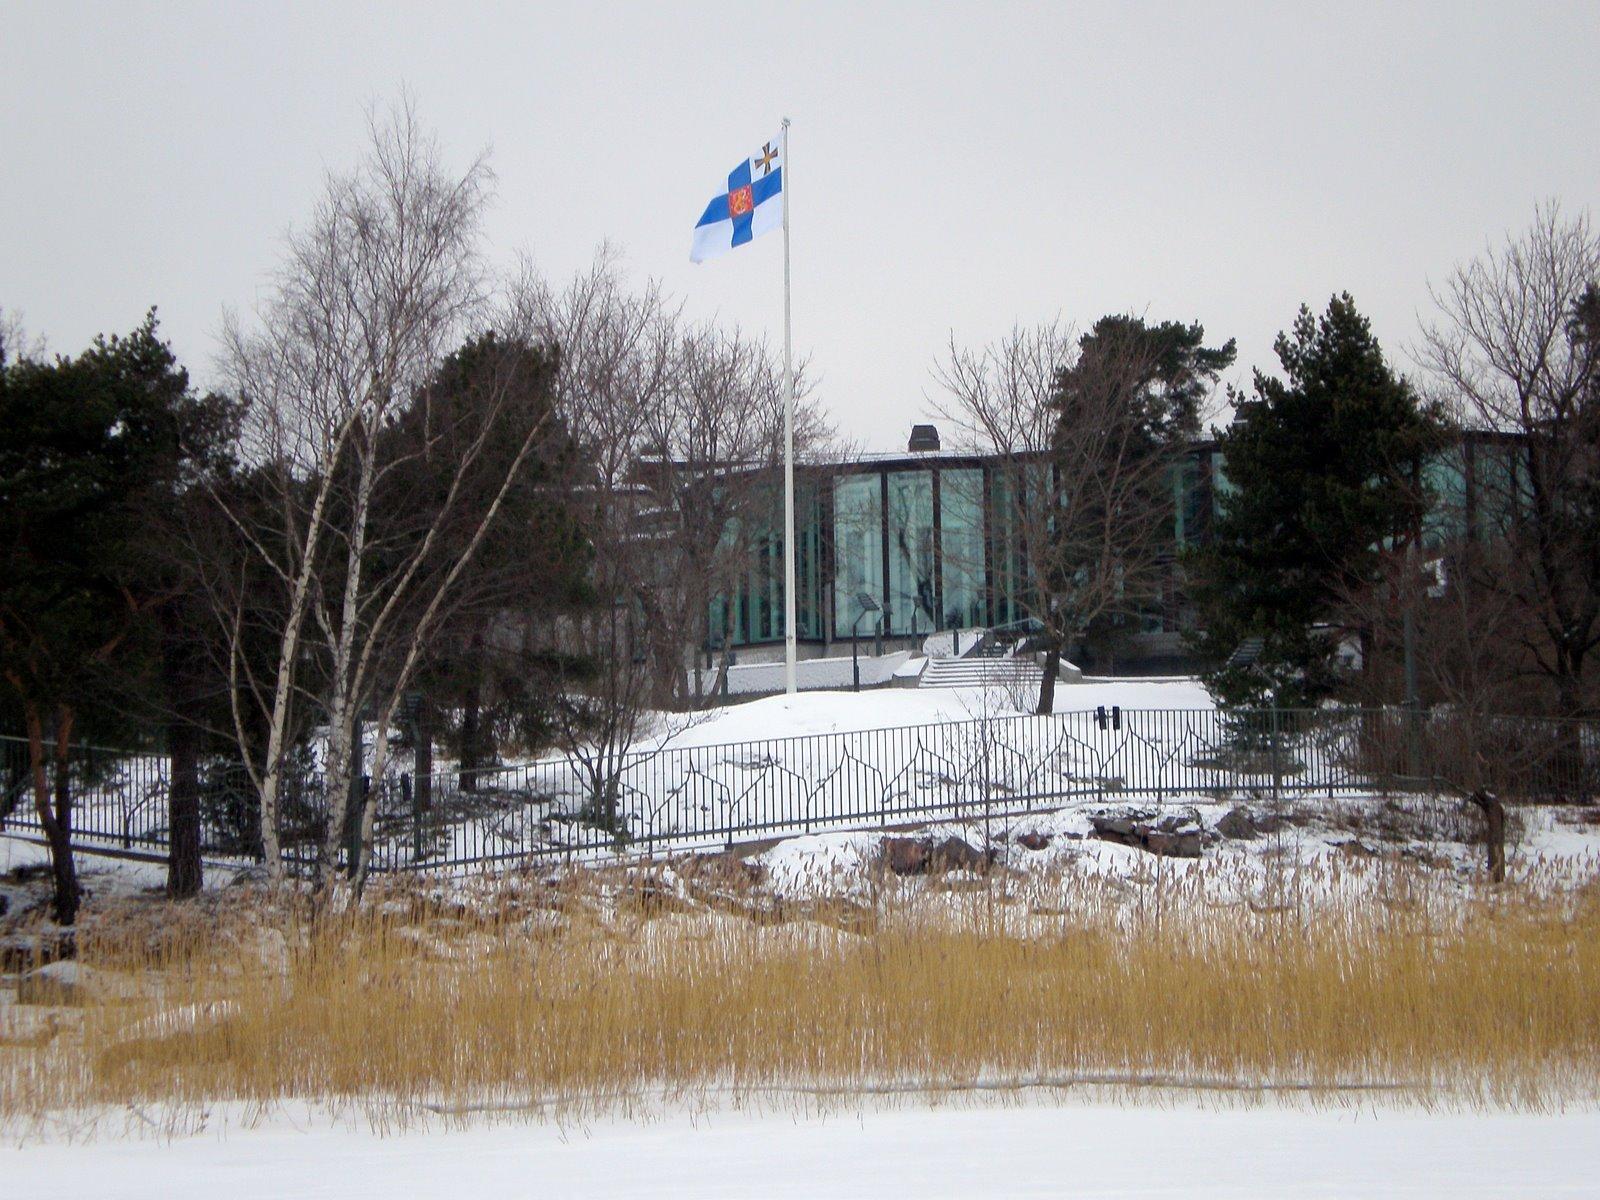 Mäntyniemi, of Talludden, de ambtswoning van de Finse president (foto via WikiMedia Commons)